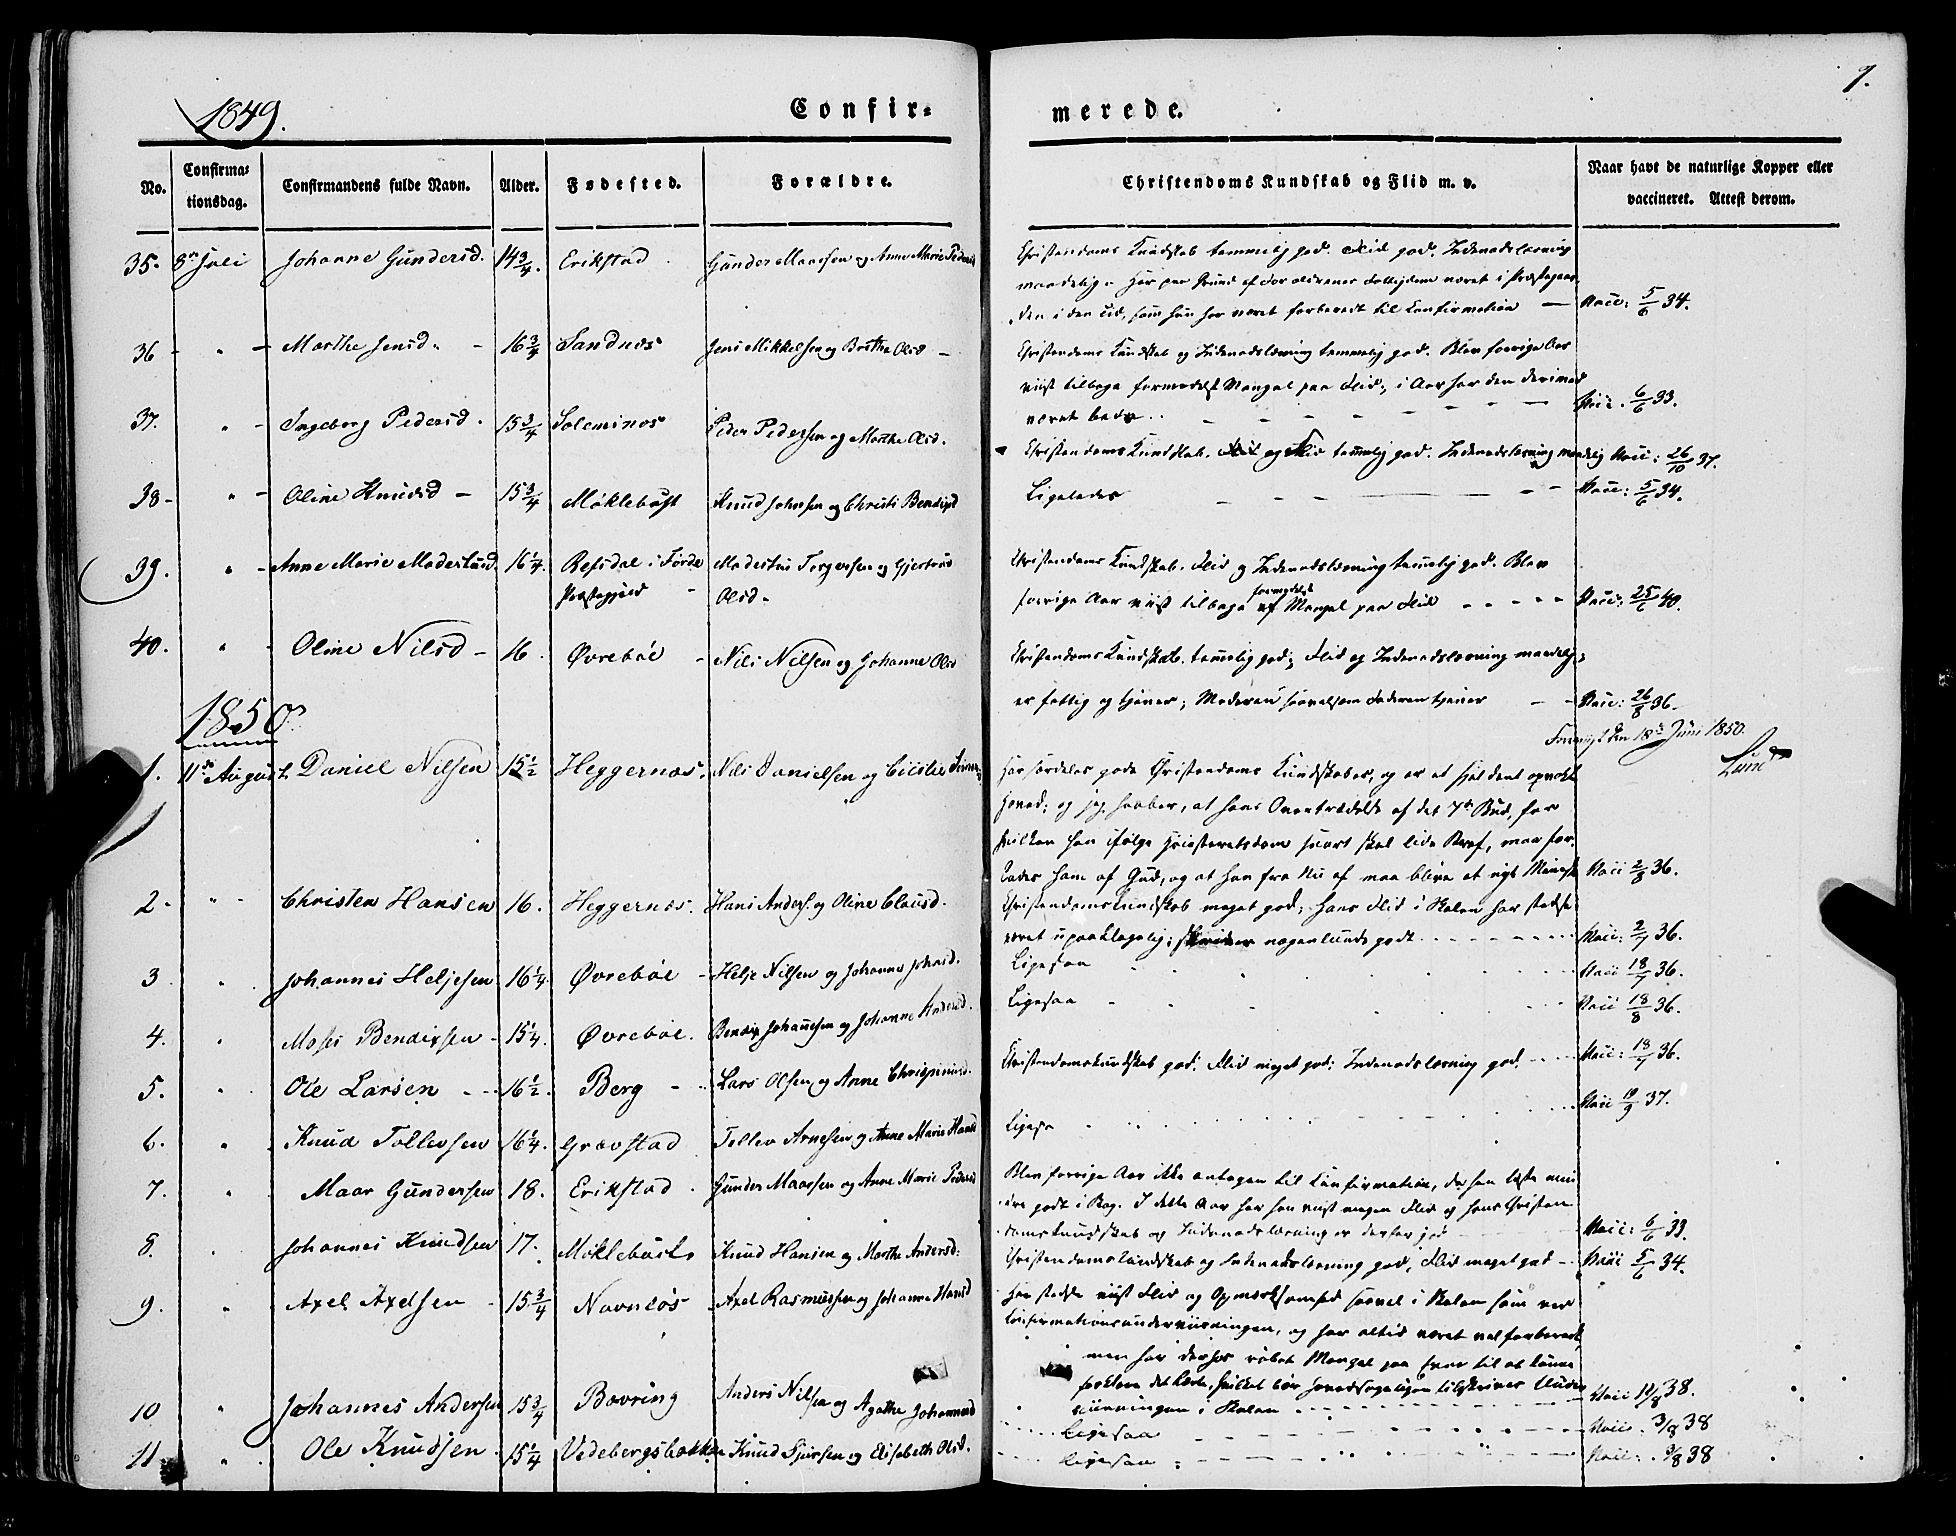 SAB, Jølster sokneprestembete, H/Haa/Haaa/L0010: Parish register (official) no. A 10, 1847-1865, p. 7